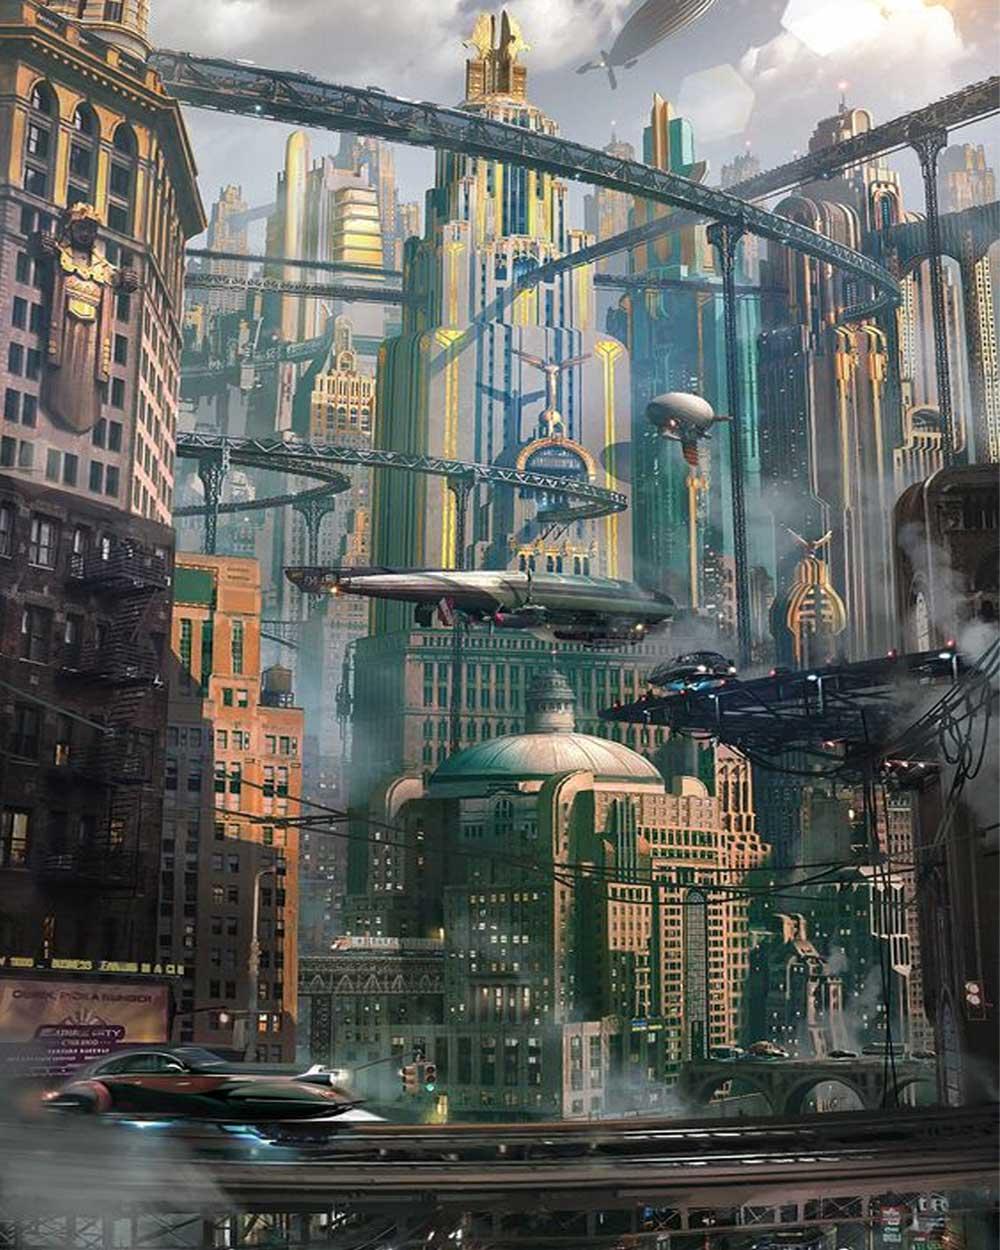 Pre-post apocalyptic retro futurism aesthetic